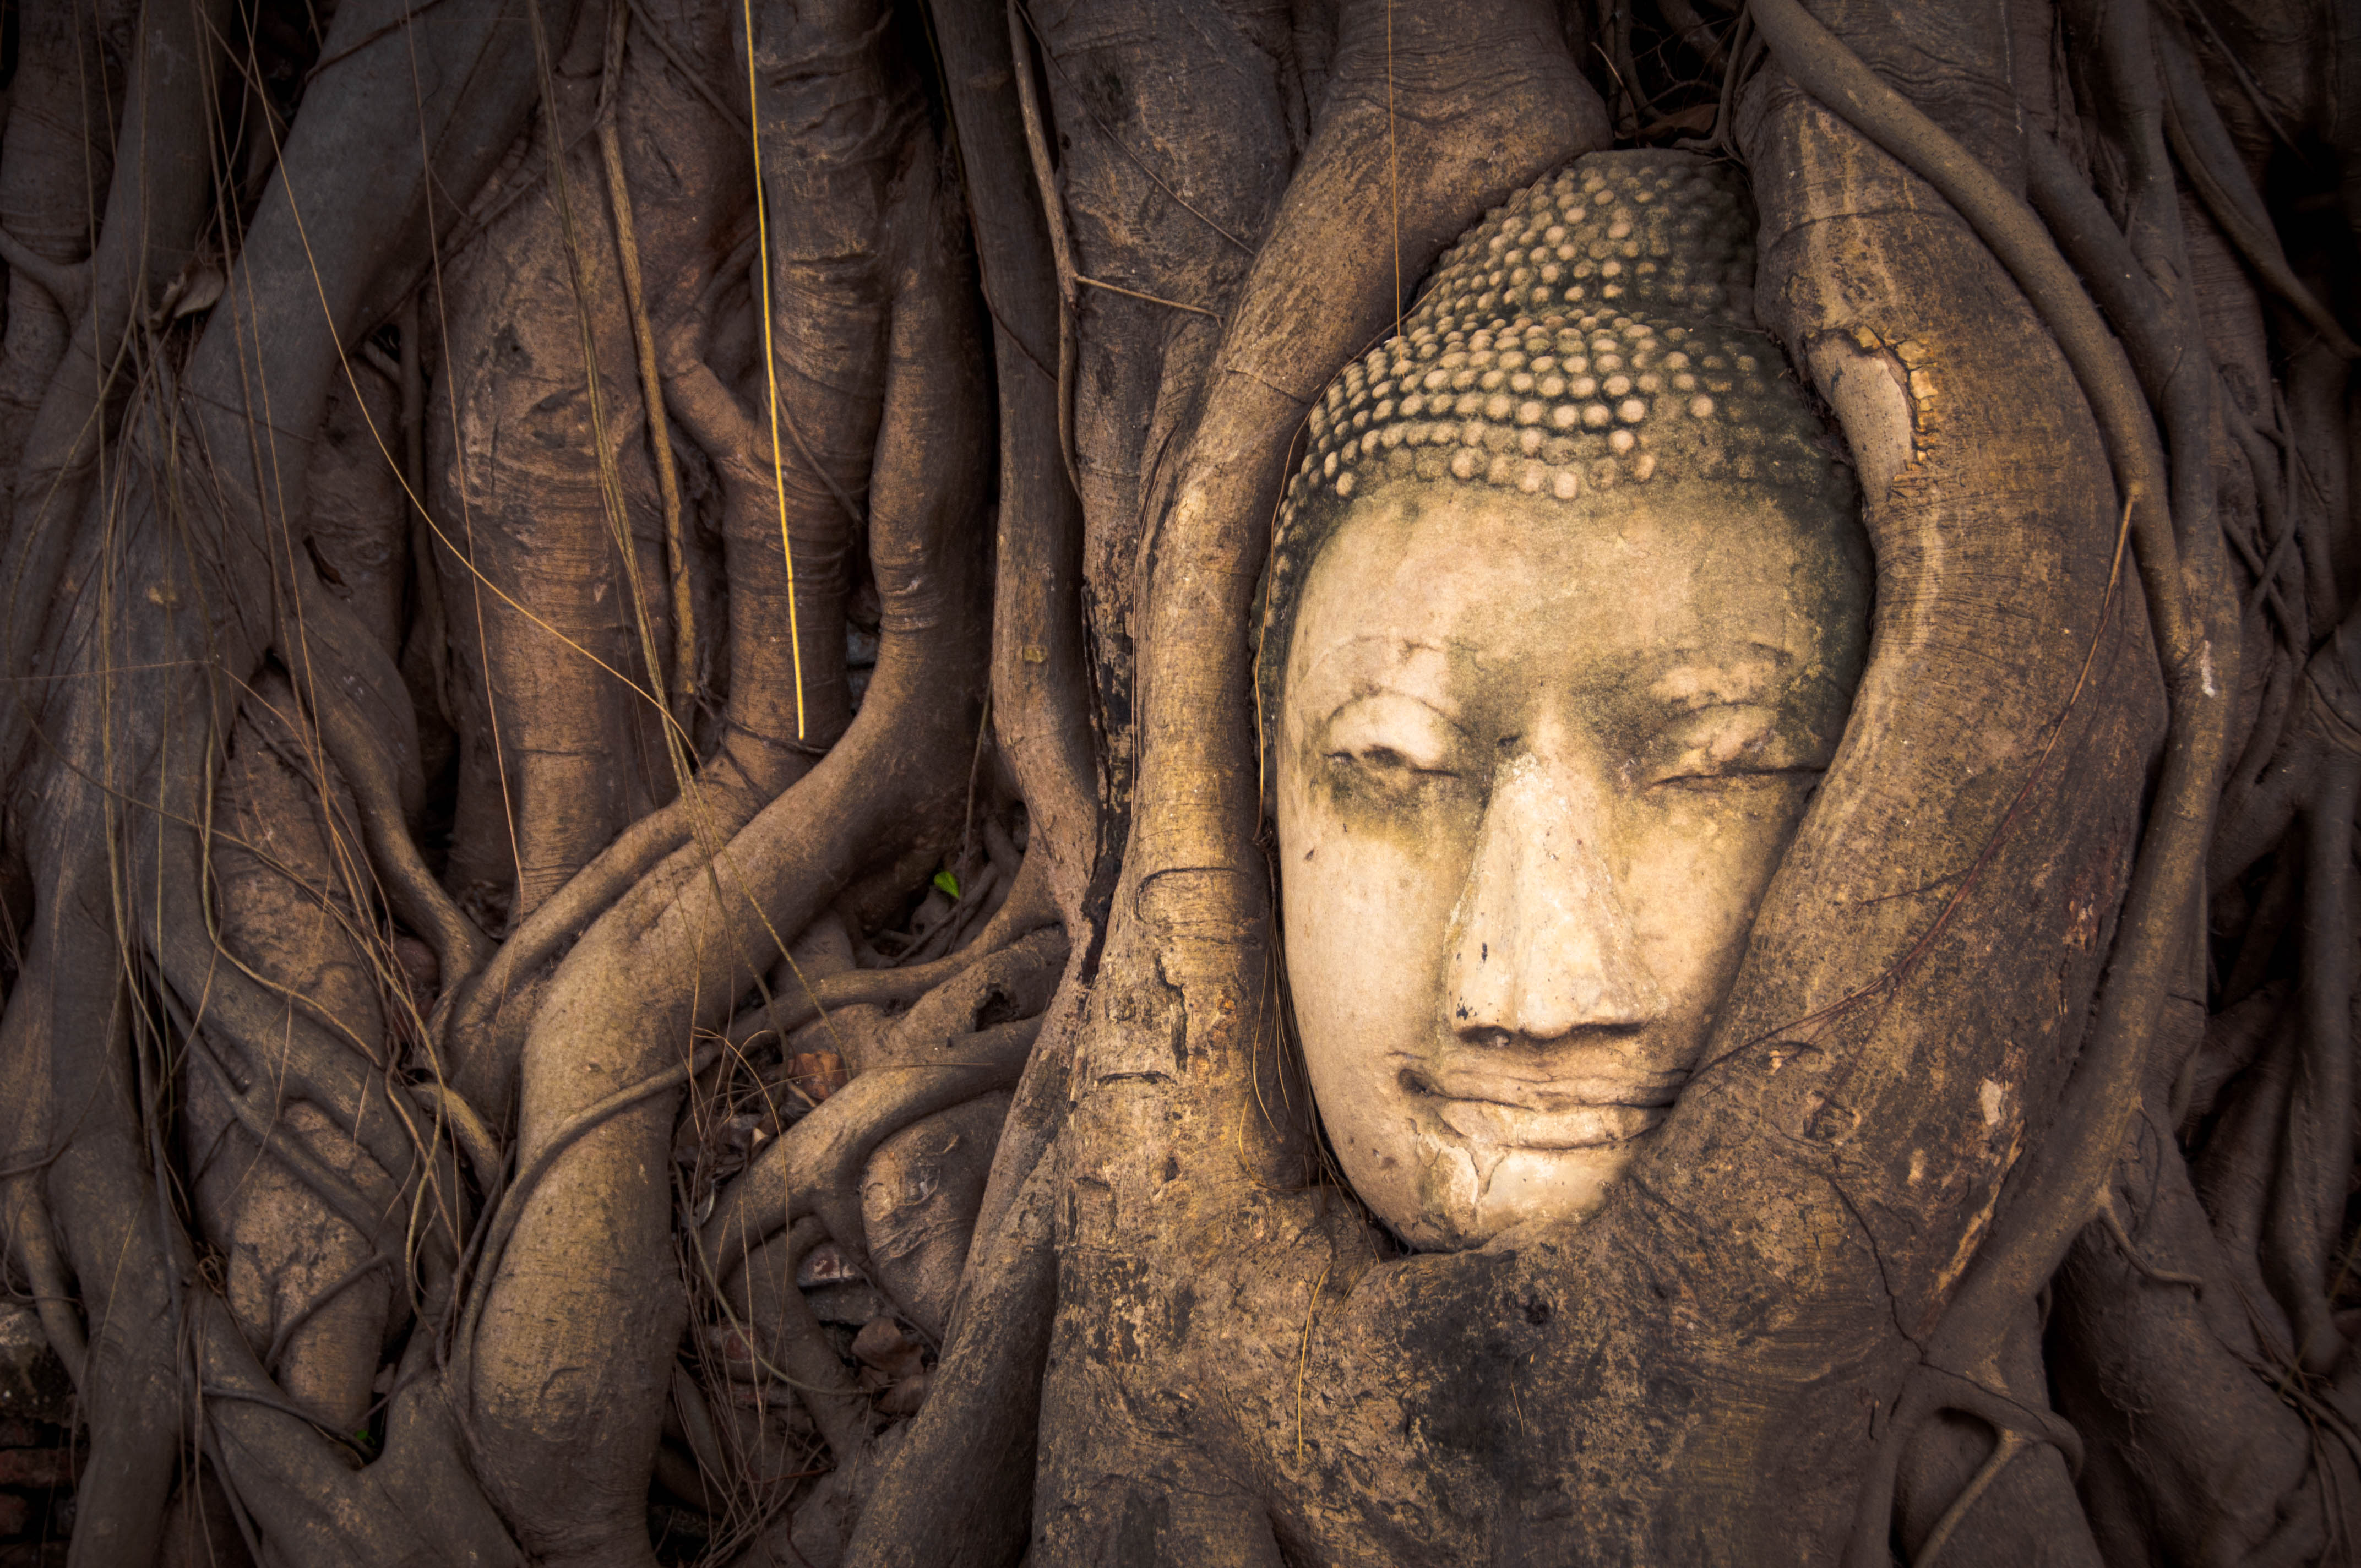 Samanta Aretino_Budismo de raíz.jpg